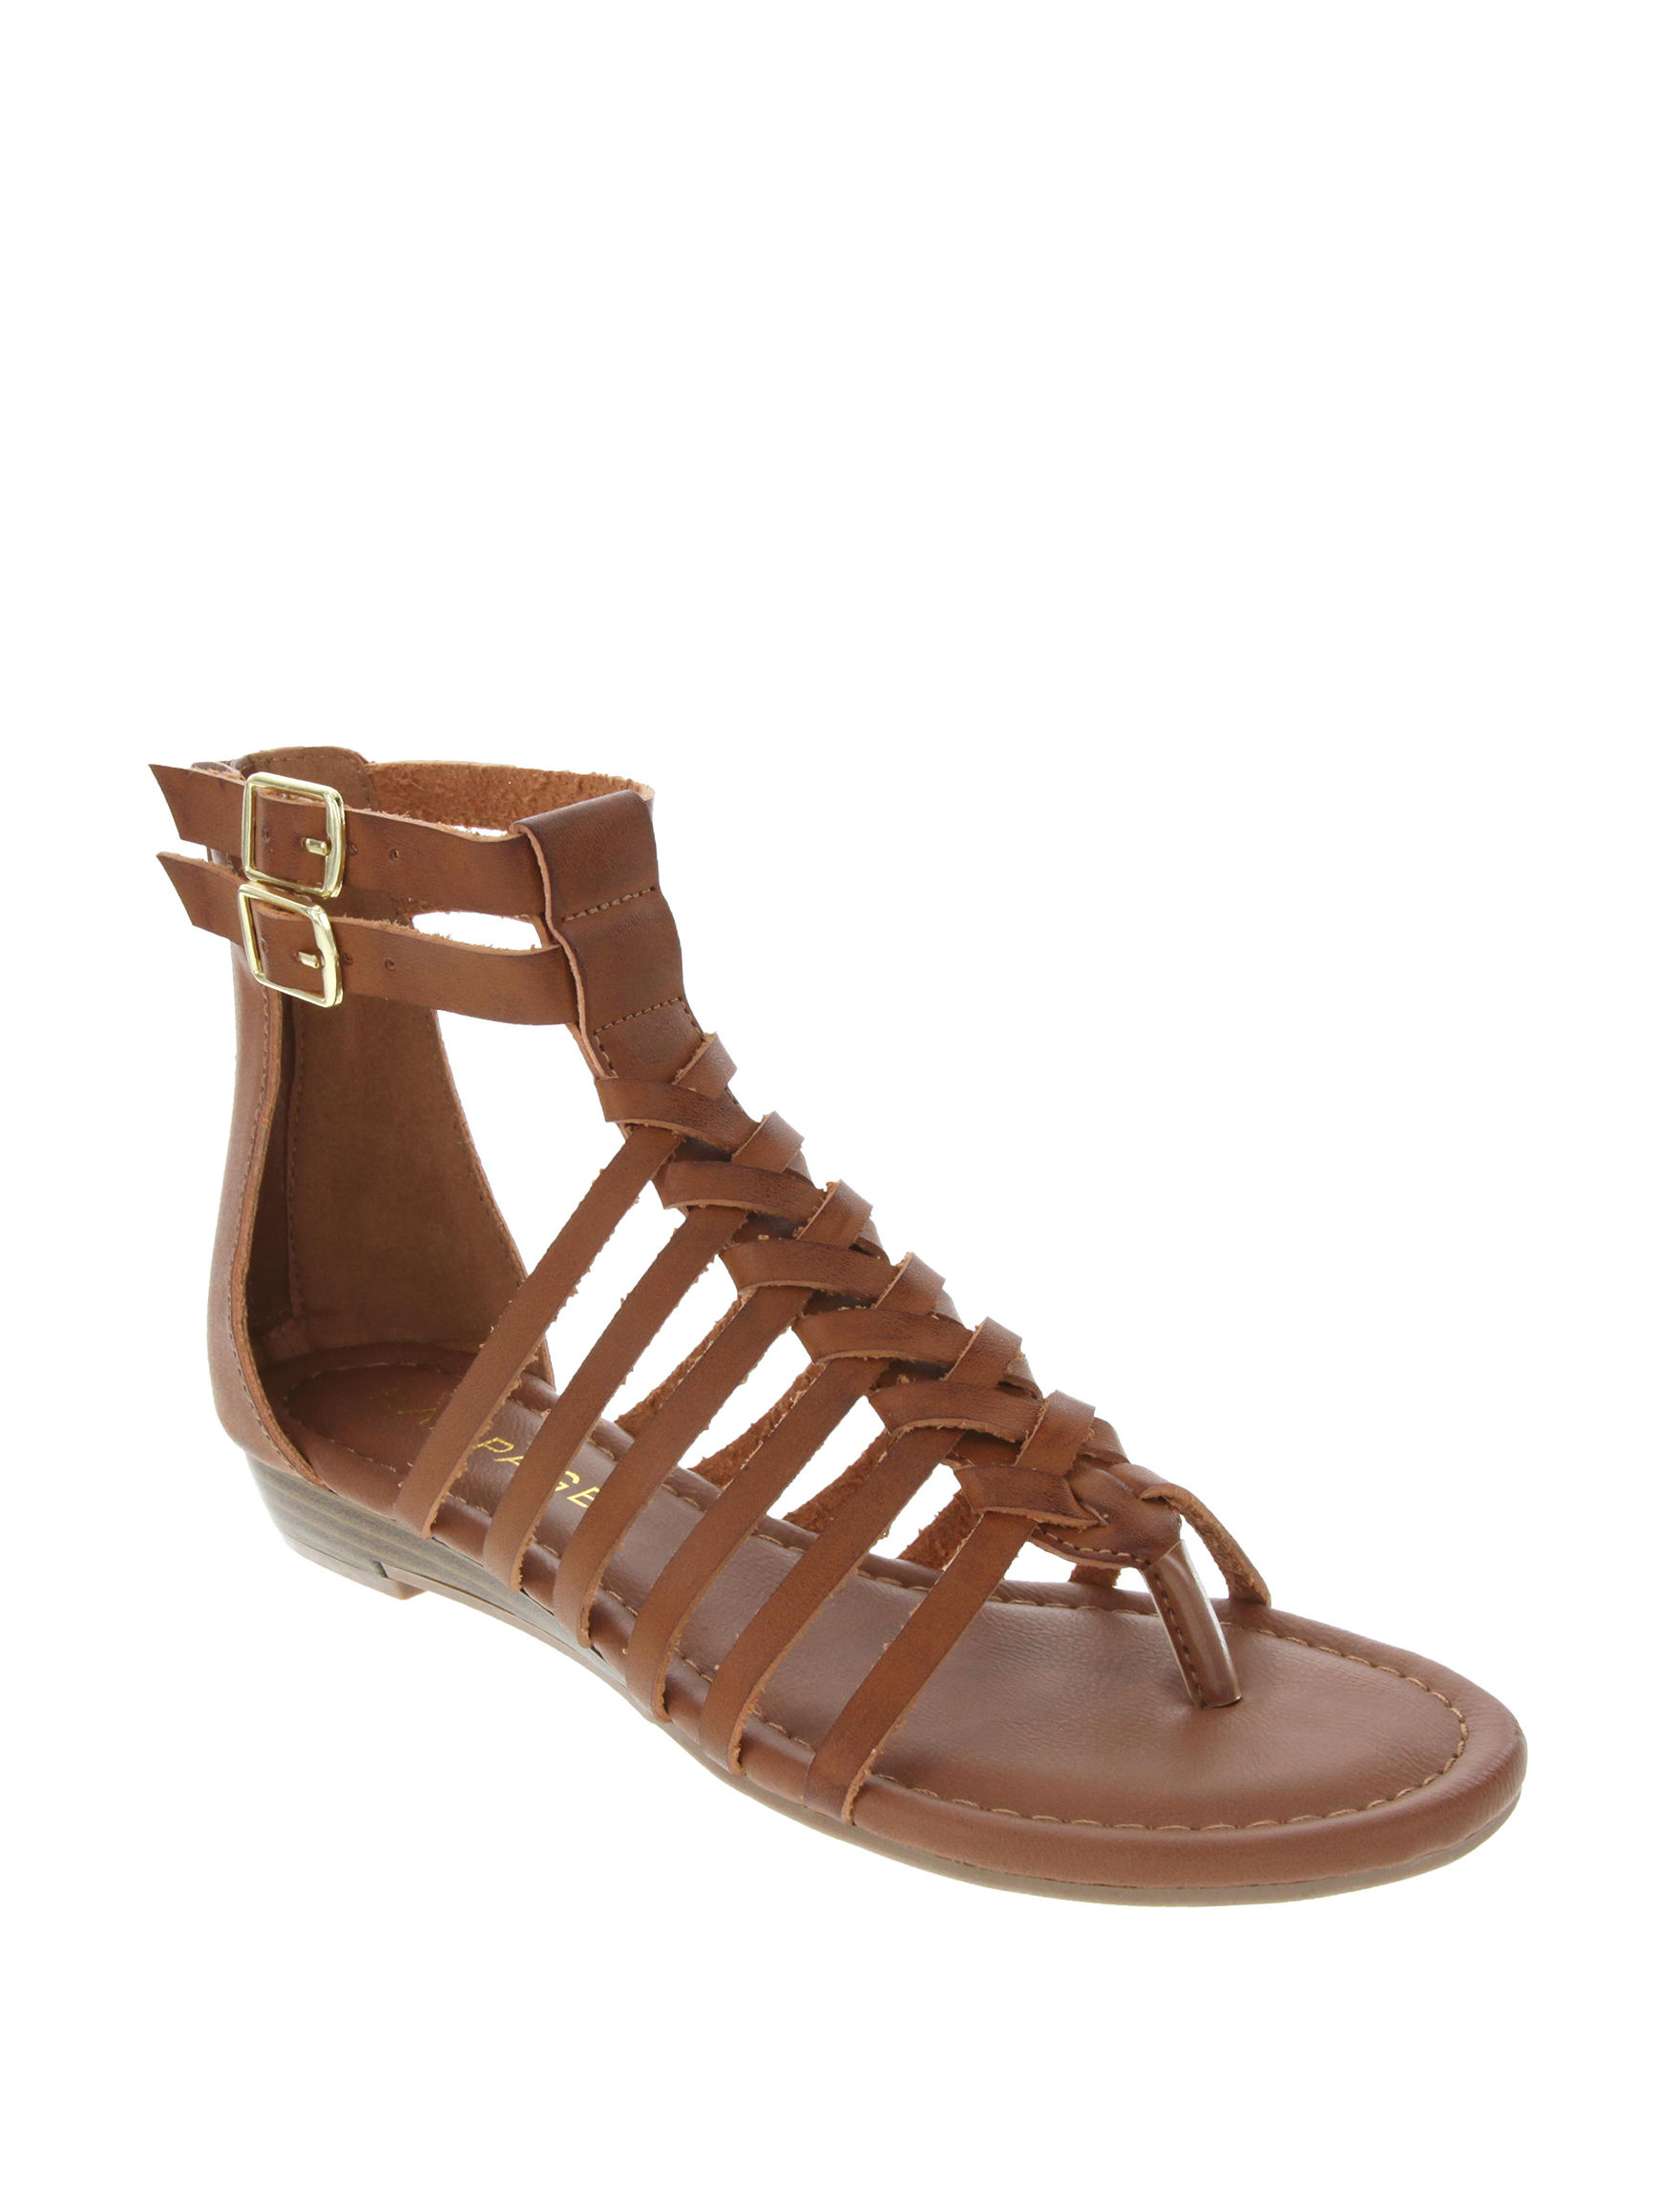 Rampage Cognac Flat Sandals Gladiators